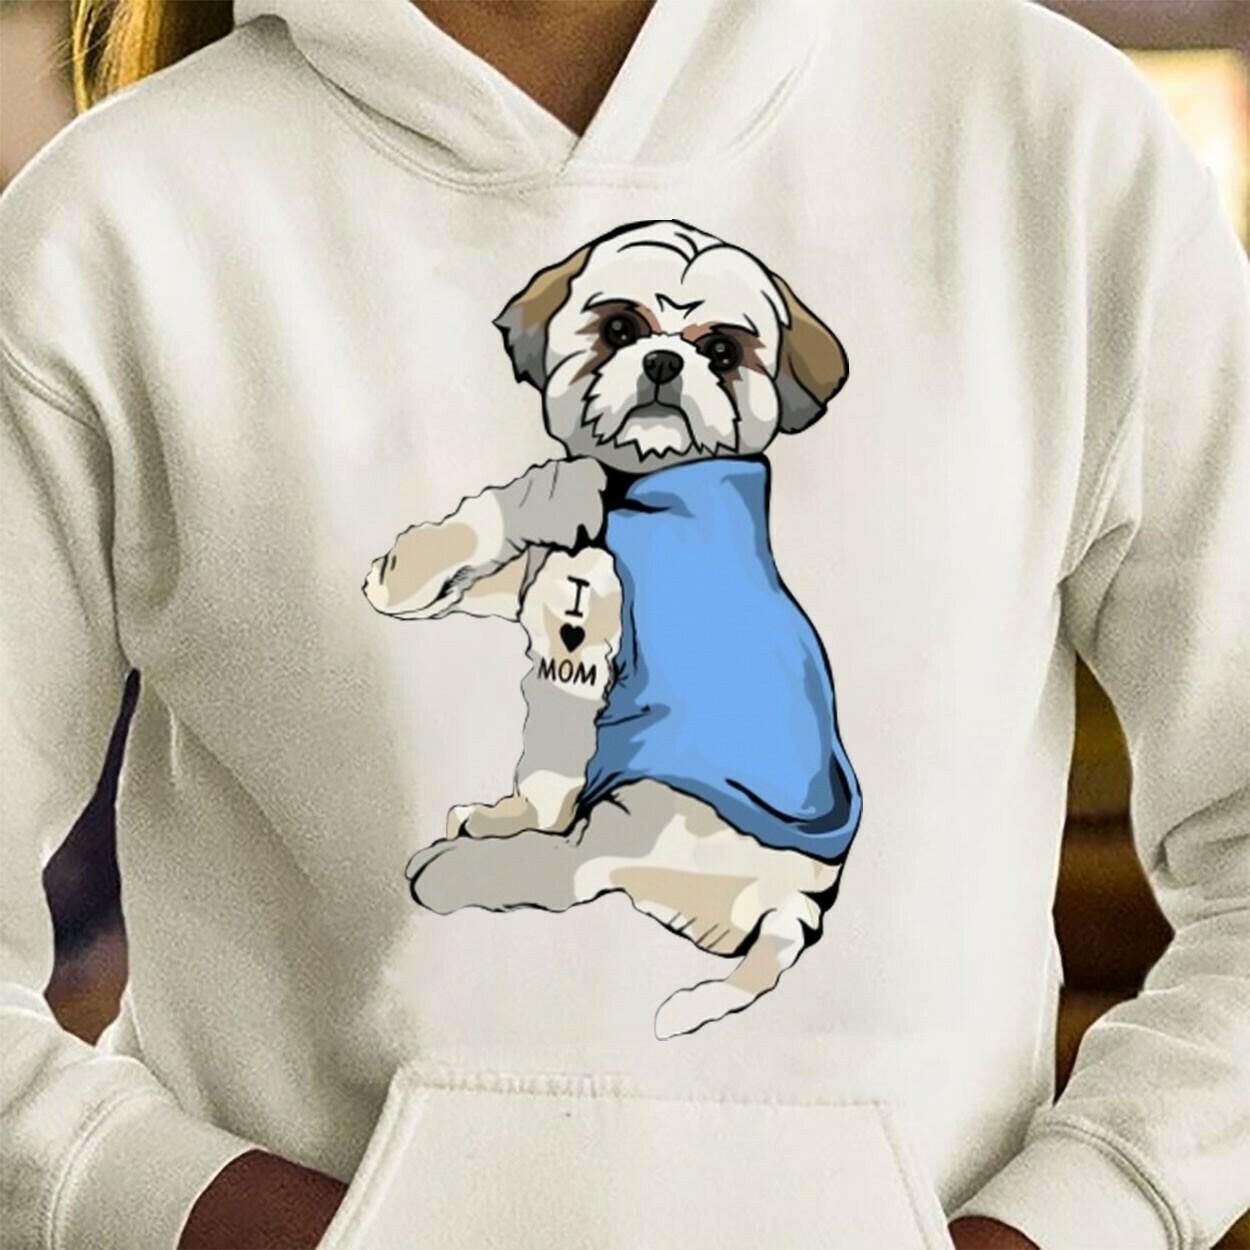 Shih Tzu Dog Tattoos I Love Mom Funny Shirt T-Shirt Hoodie Sweatshirt Sweater Tee Kids Youth Gifts Jolly Family Gifts